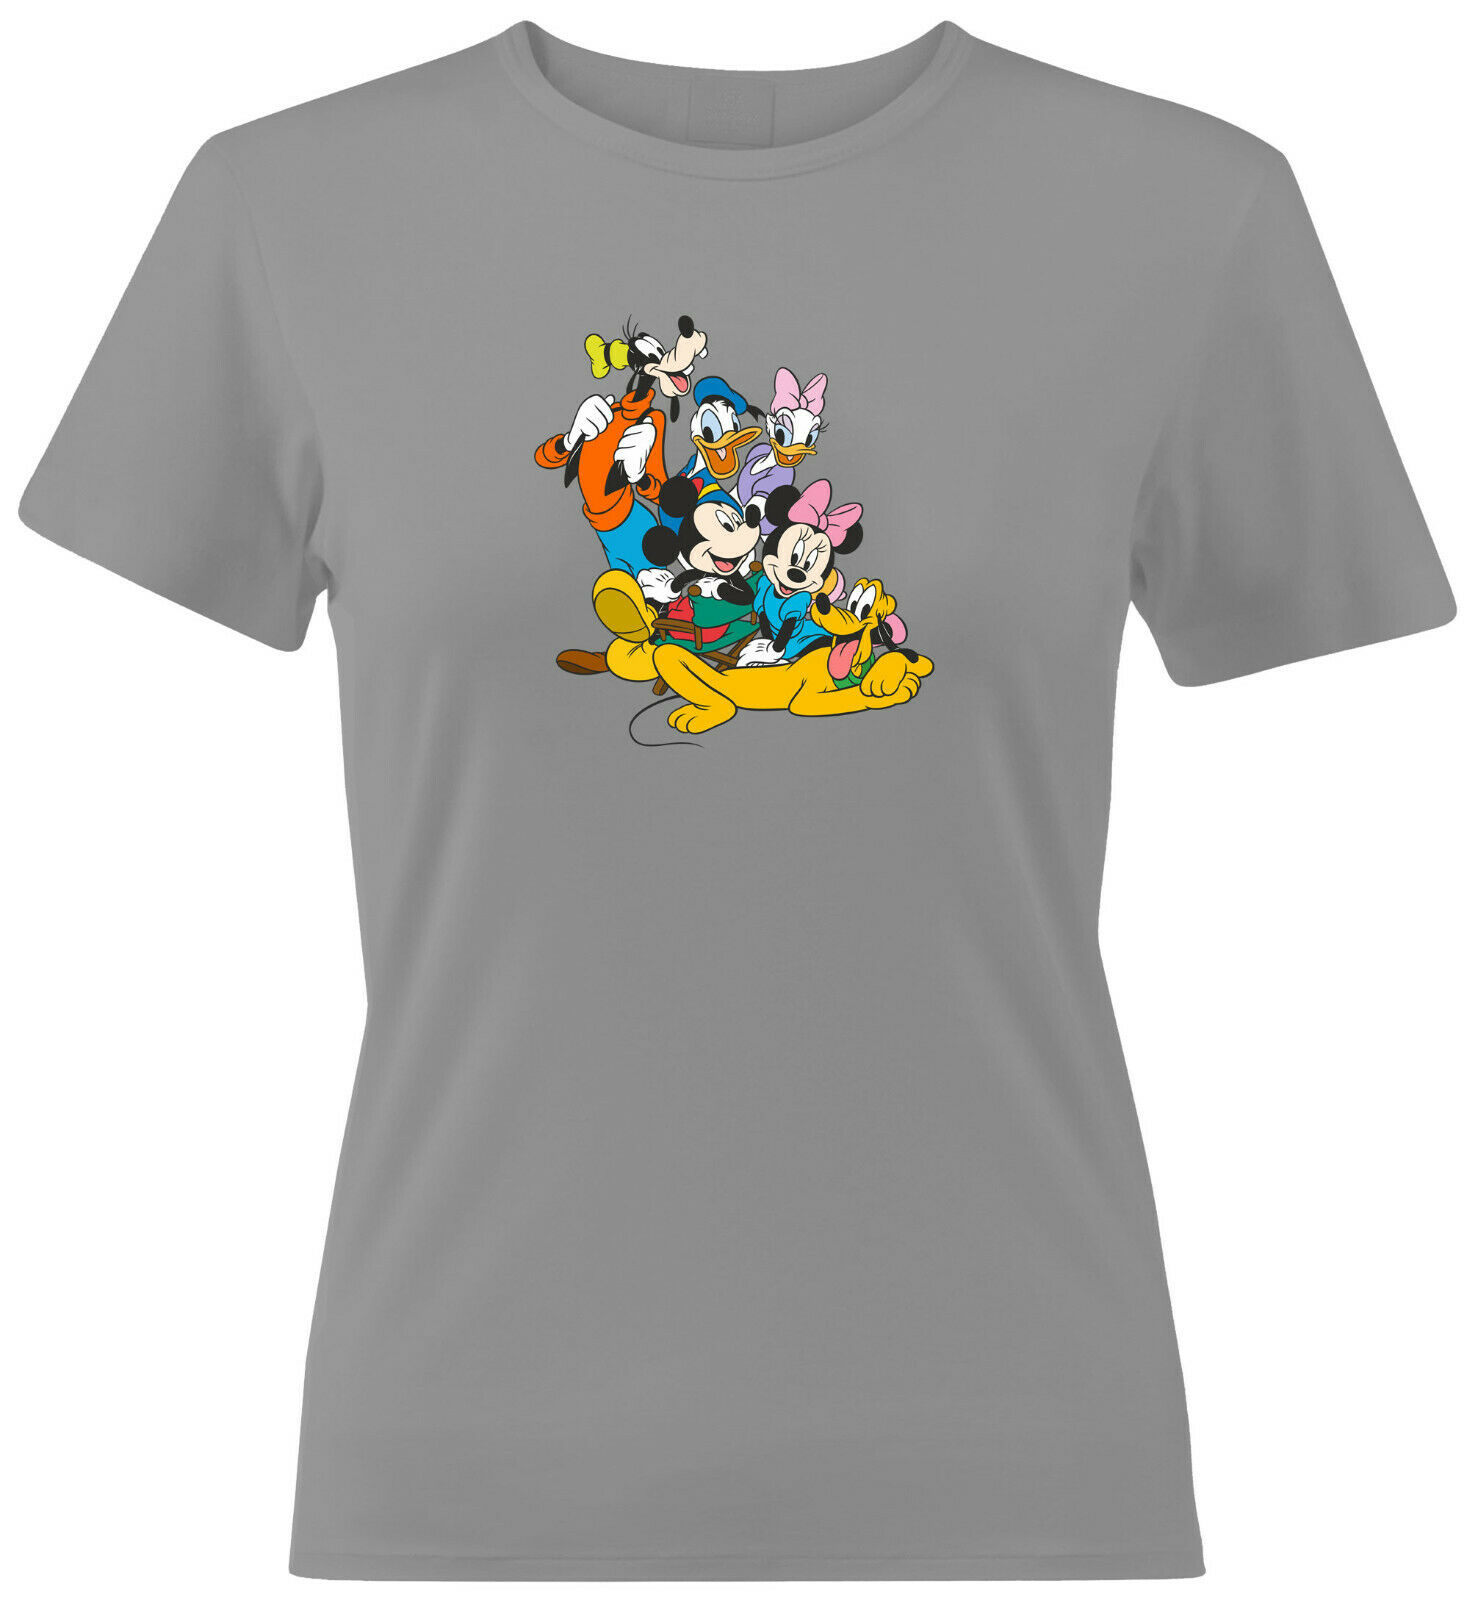 Disney Mickey Minnie Mouse Goofy Donald Duck 2020 Men Women Unisex T-shirt V202